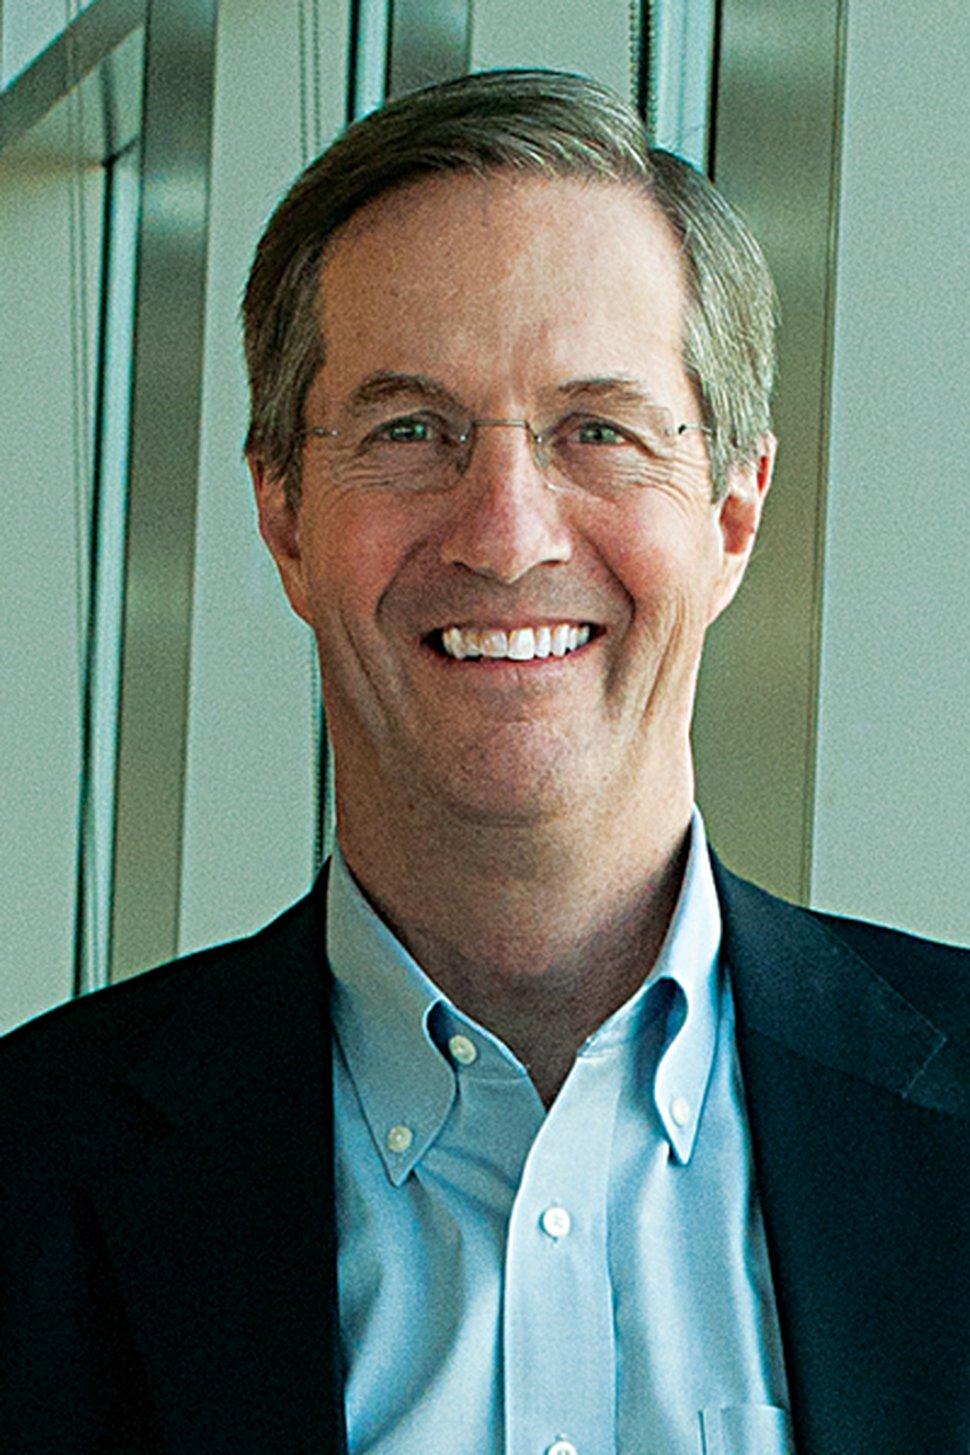 Bill Wyatt, executive director of Salt Lake City International Airport.